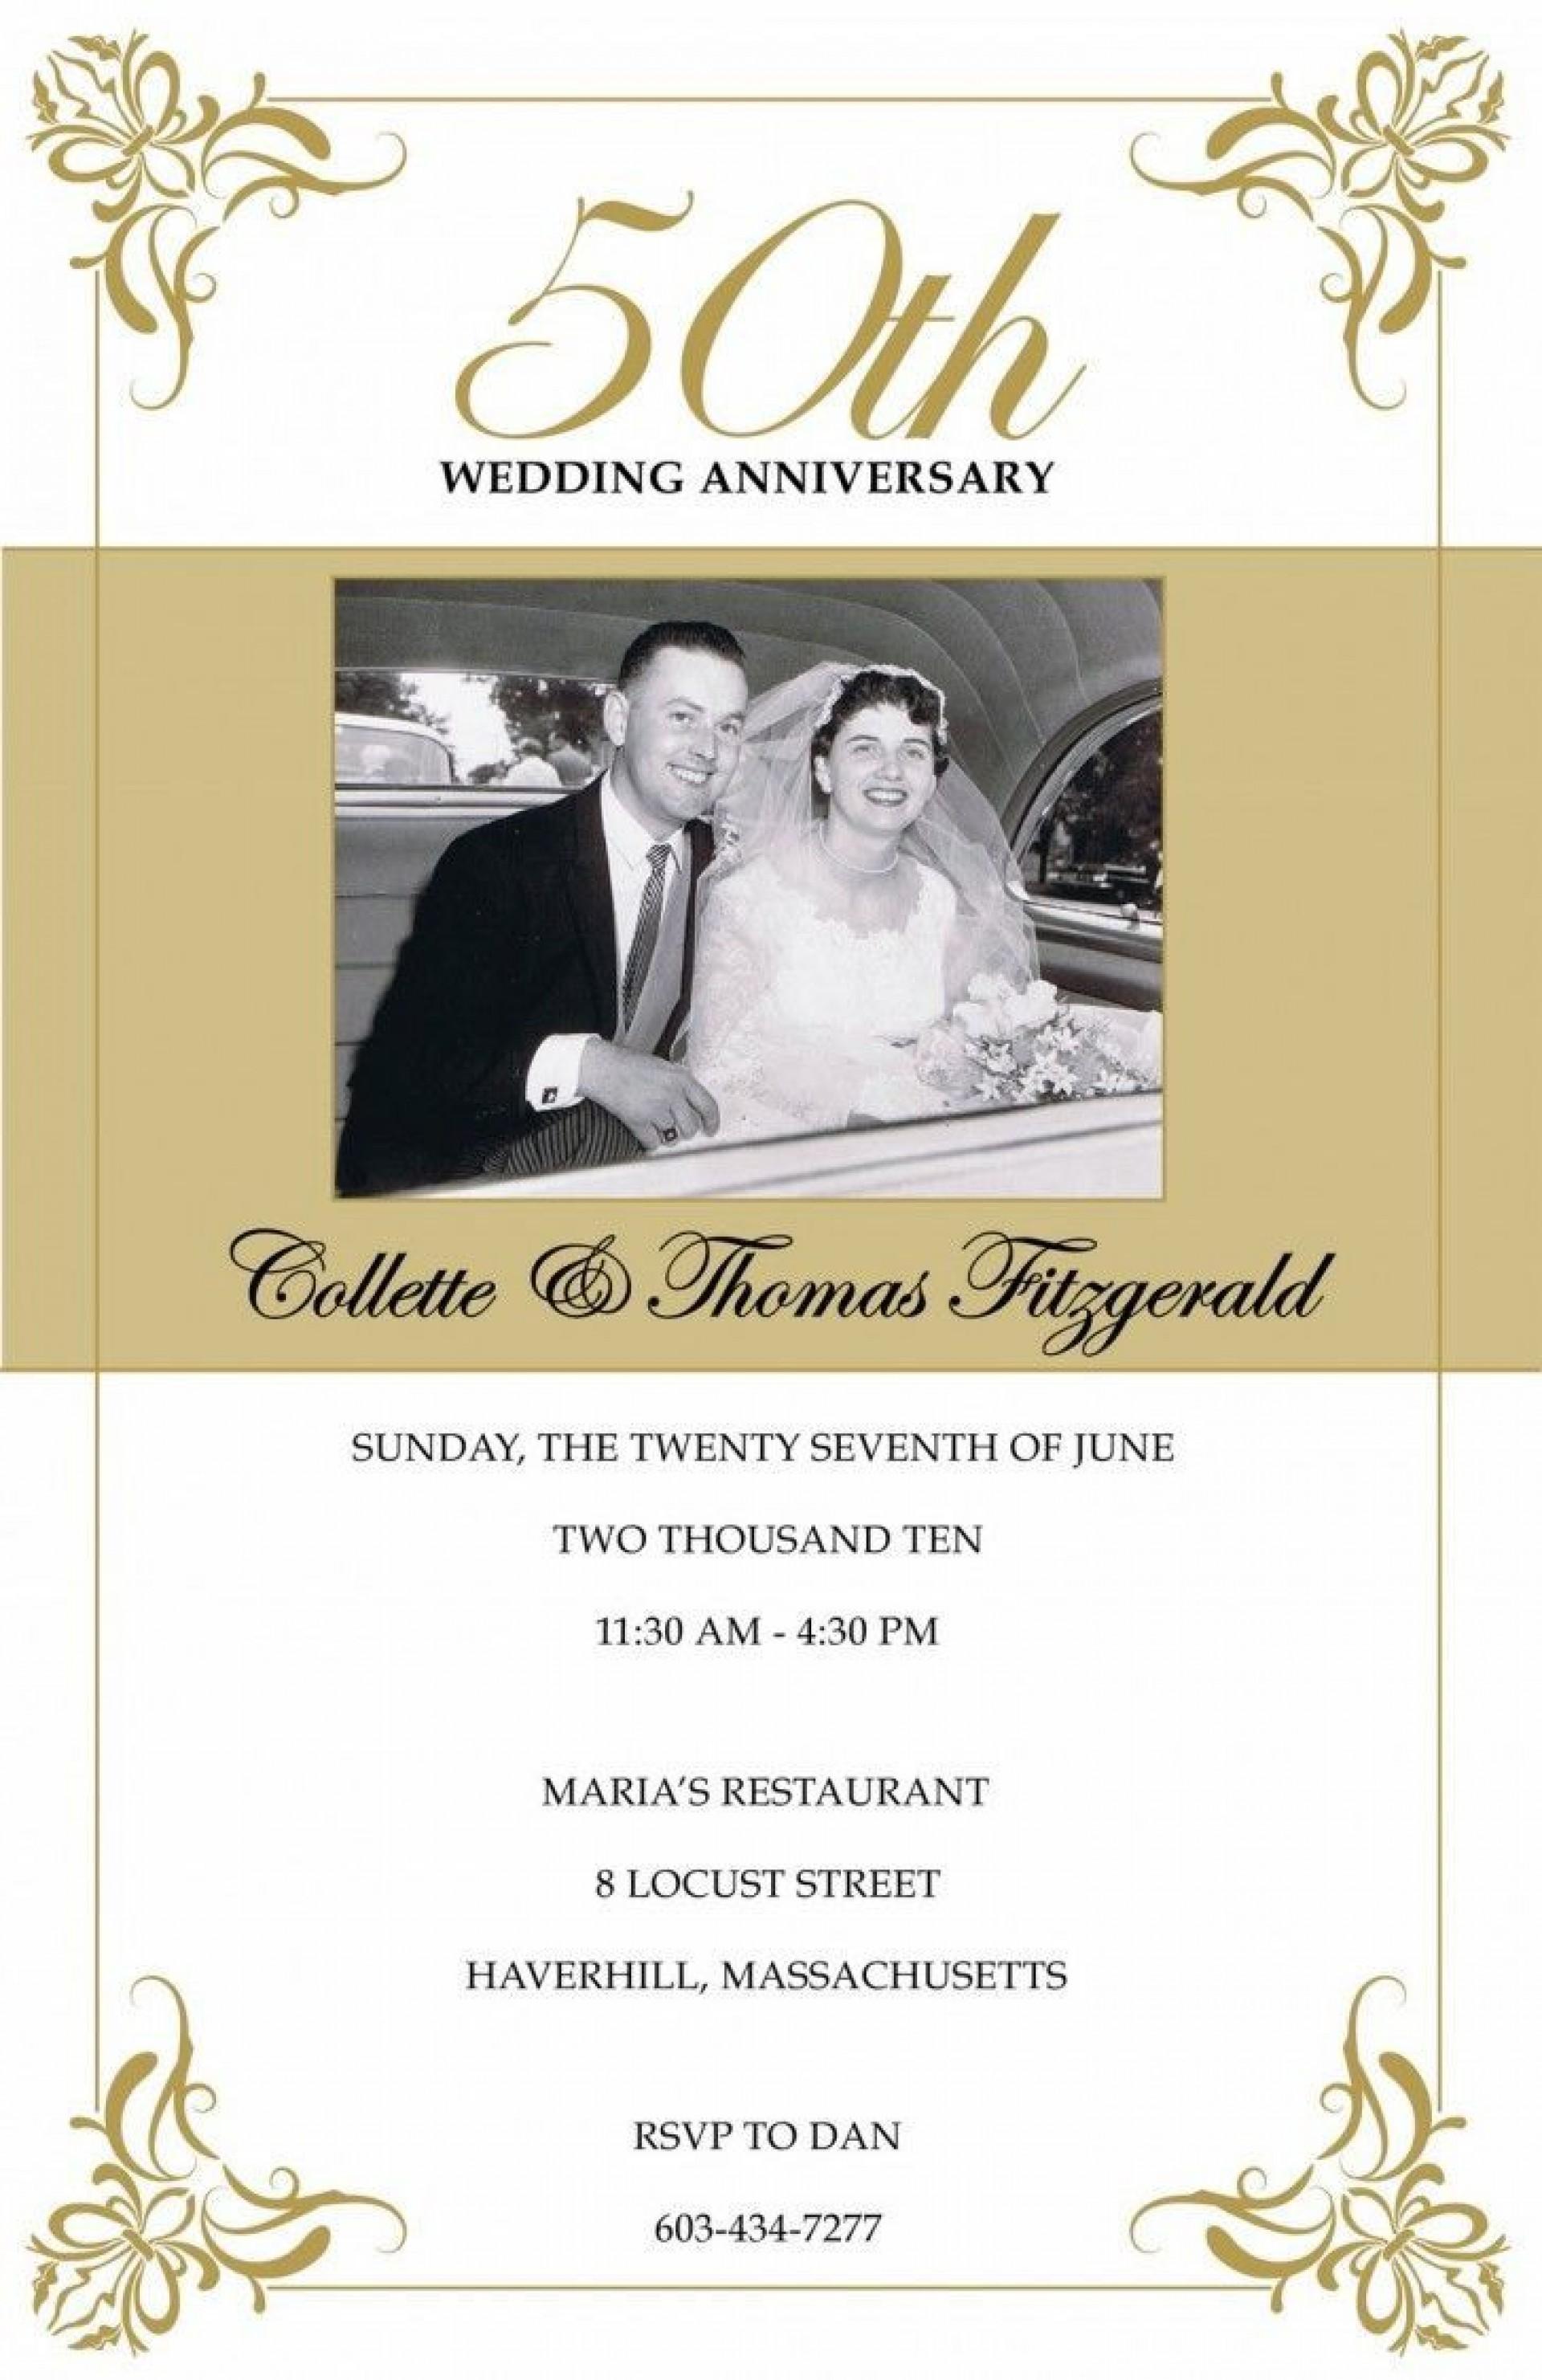 006 Stunning 50th Wedding Anniversary Invitation Template Highest Quality  Templates Card Sample Golden1920